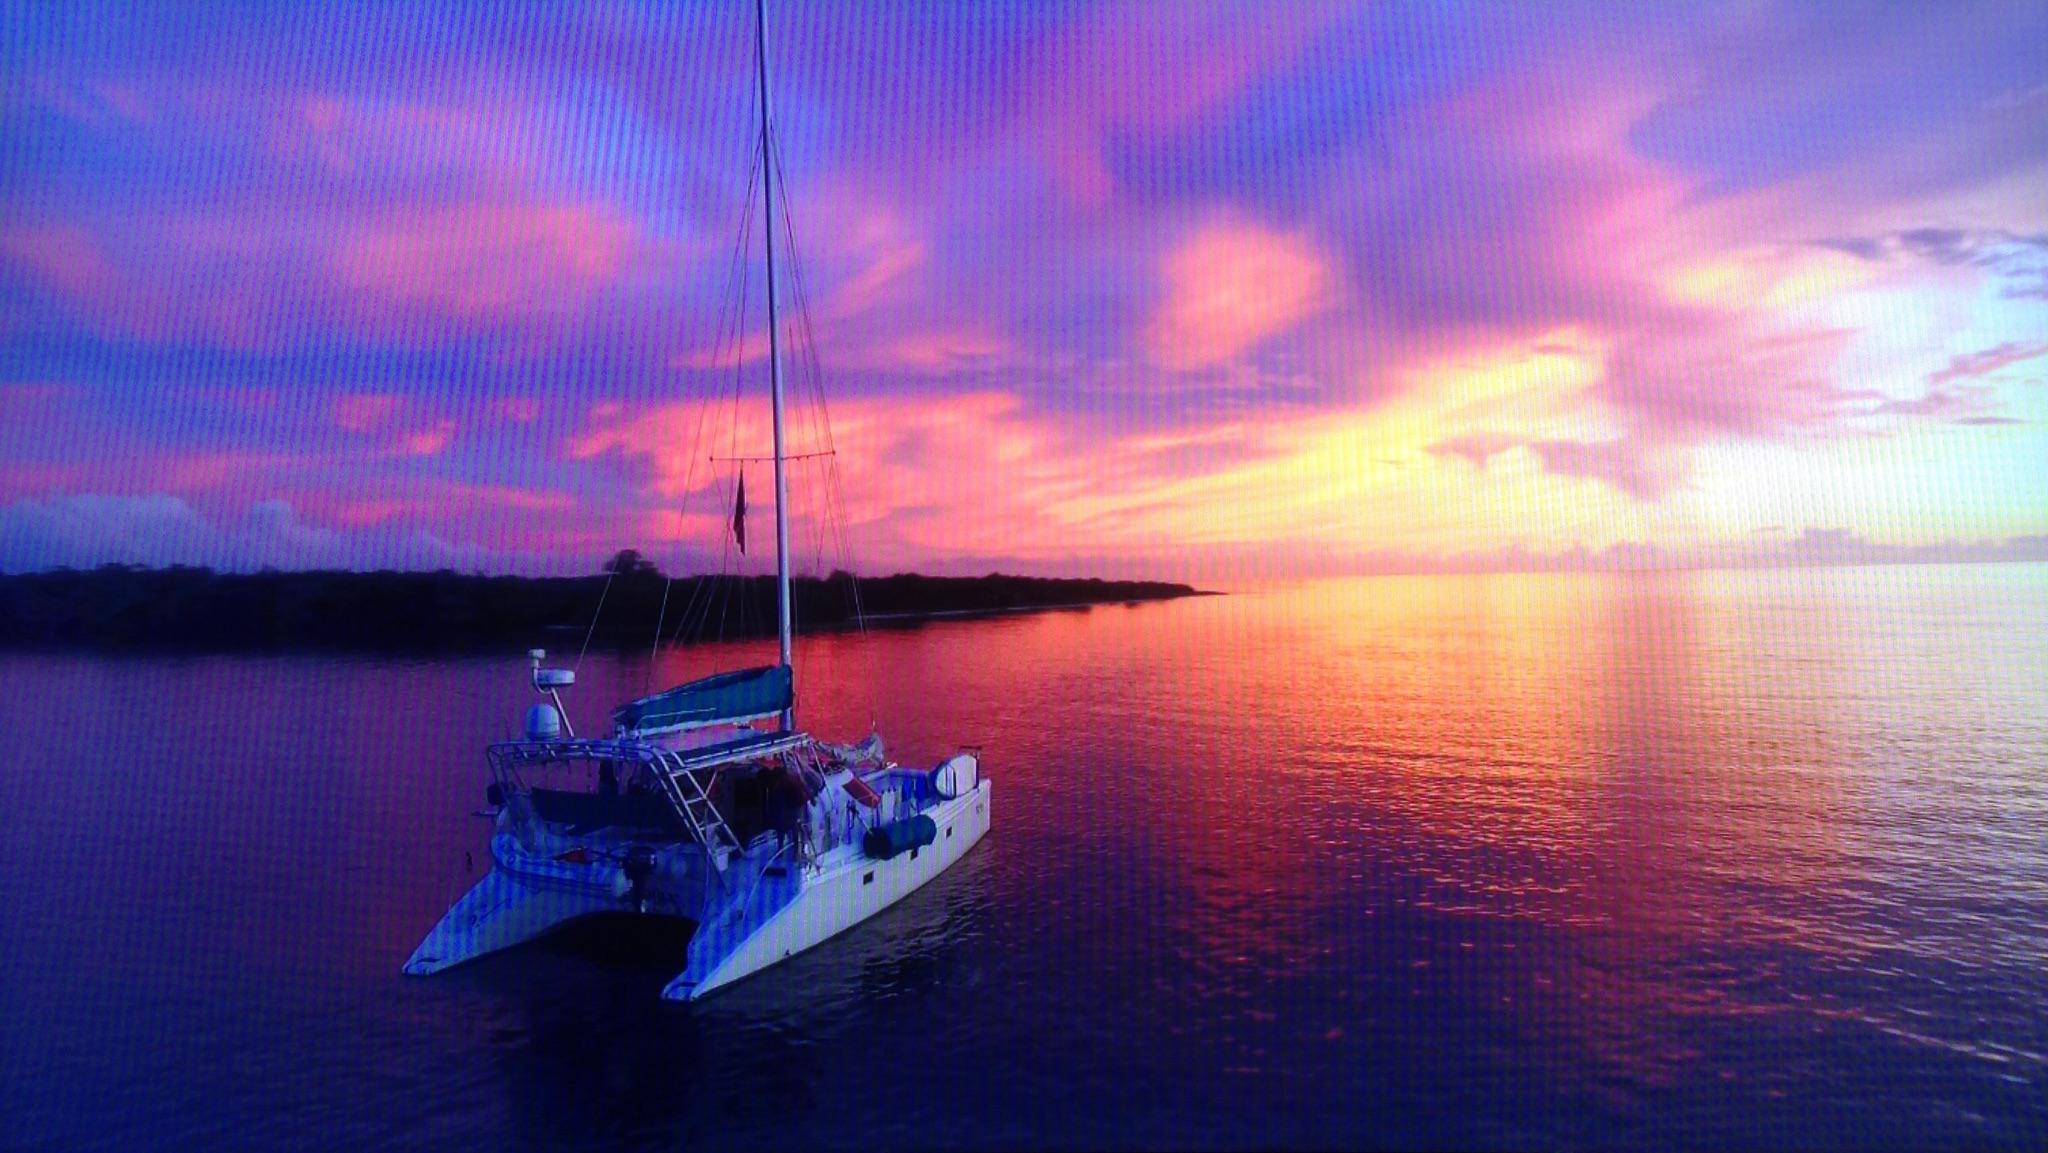 Tortuga Sunset at Boca drone.JPG